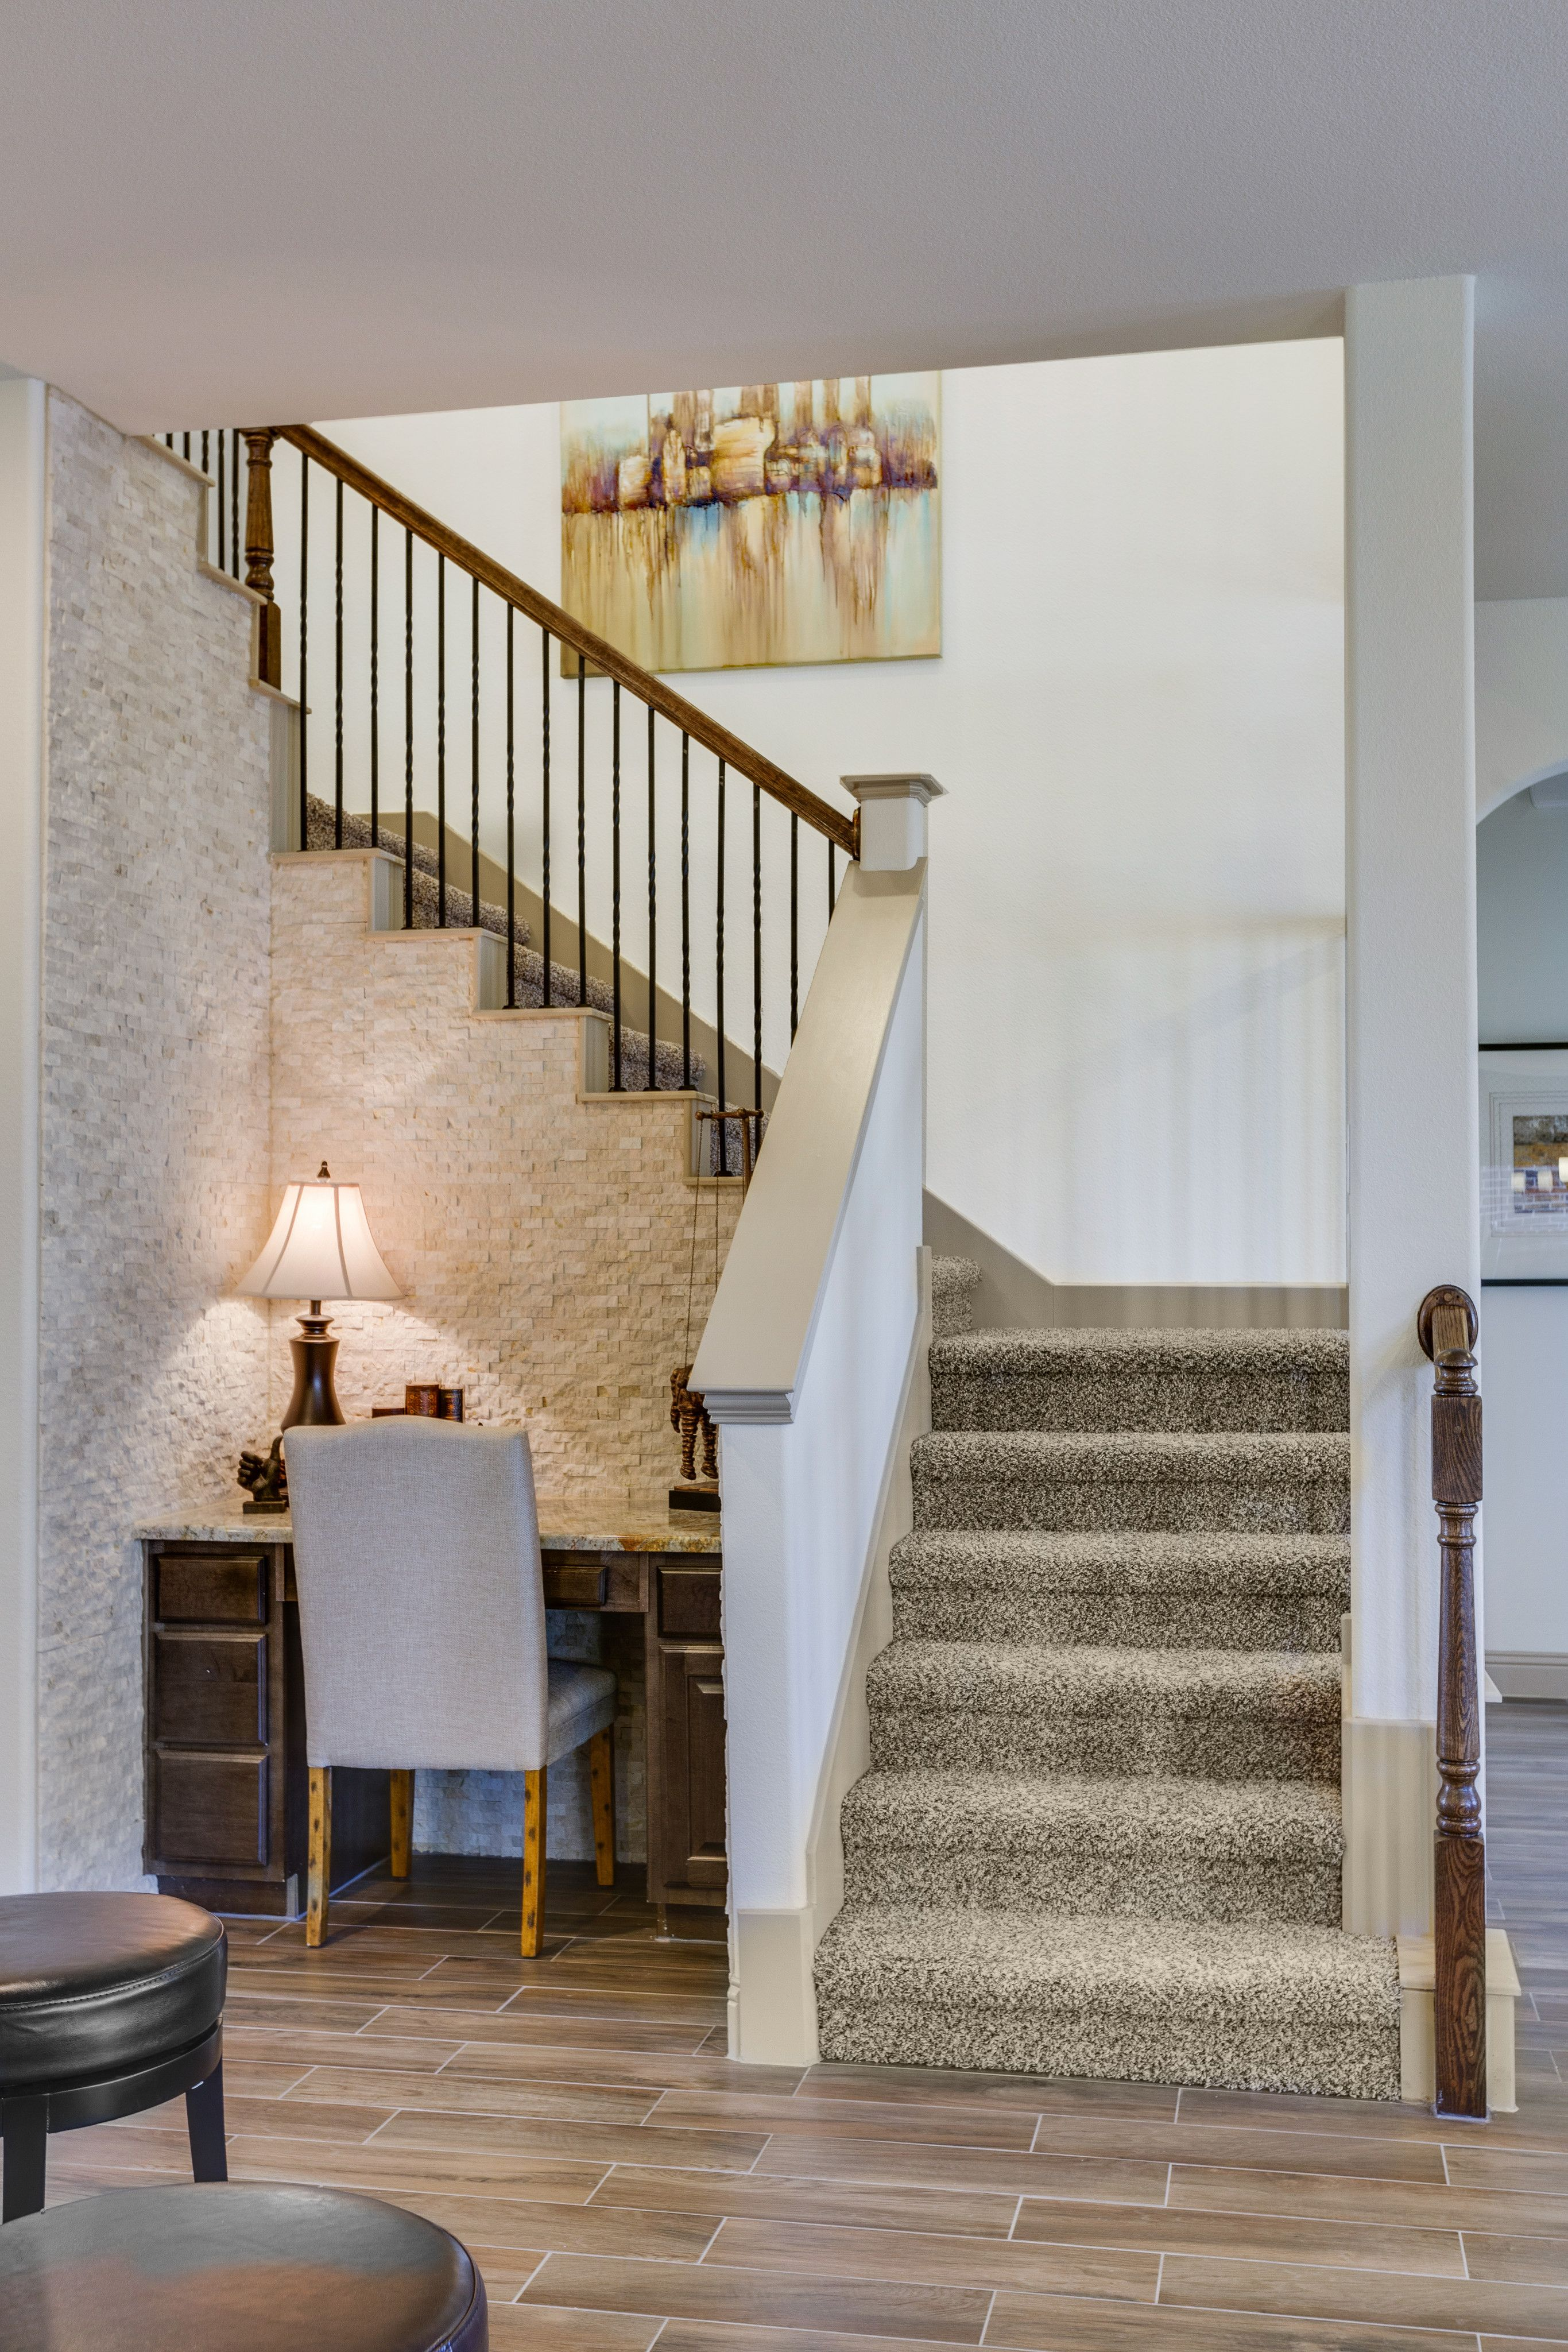 Gehan homes stairway carpet staircase beige brick u shaped room dailygadgetfo Image collections